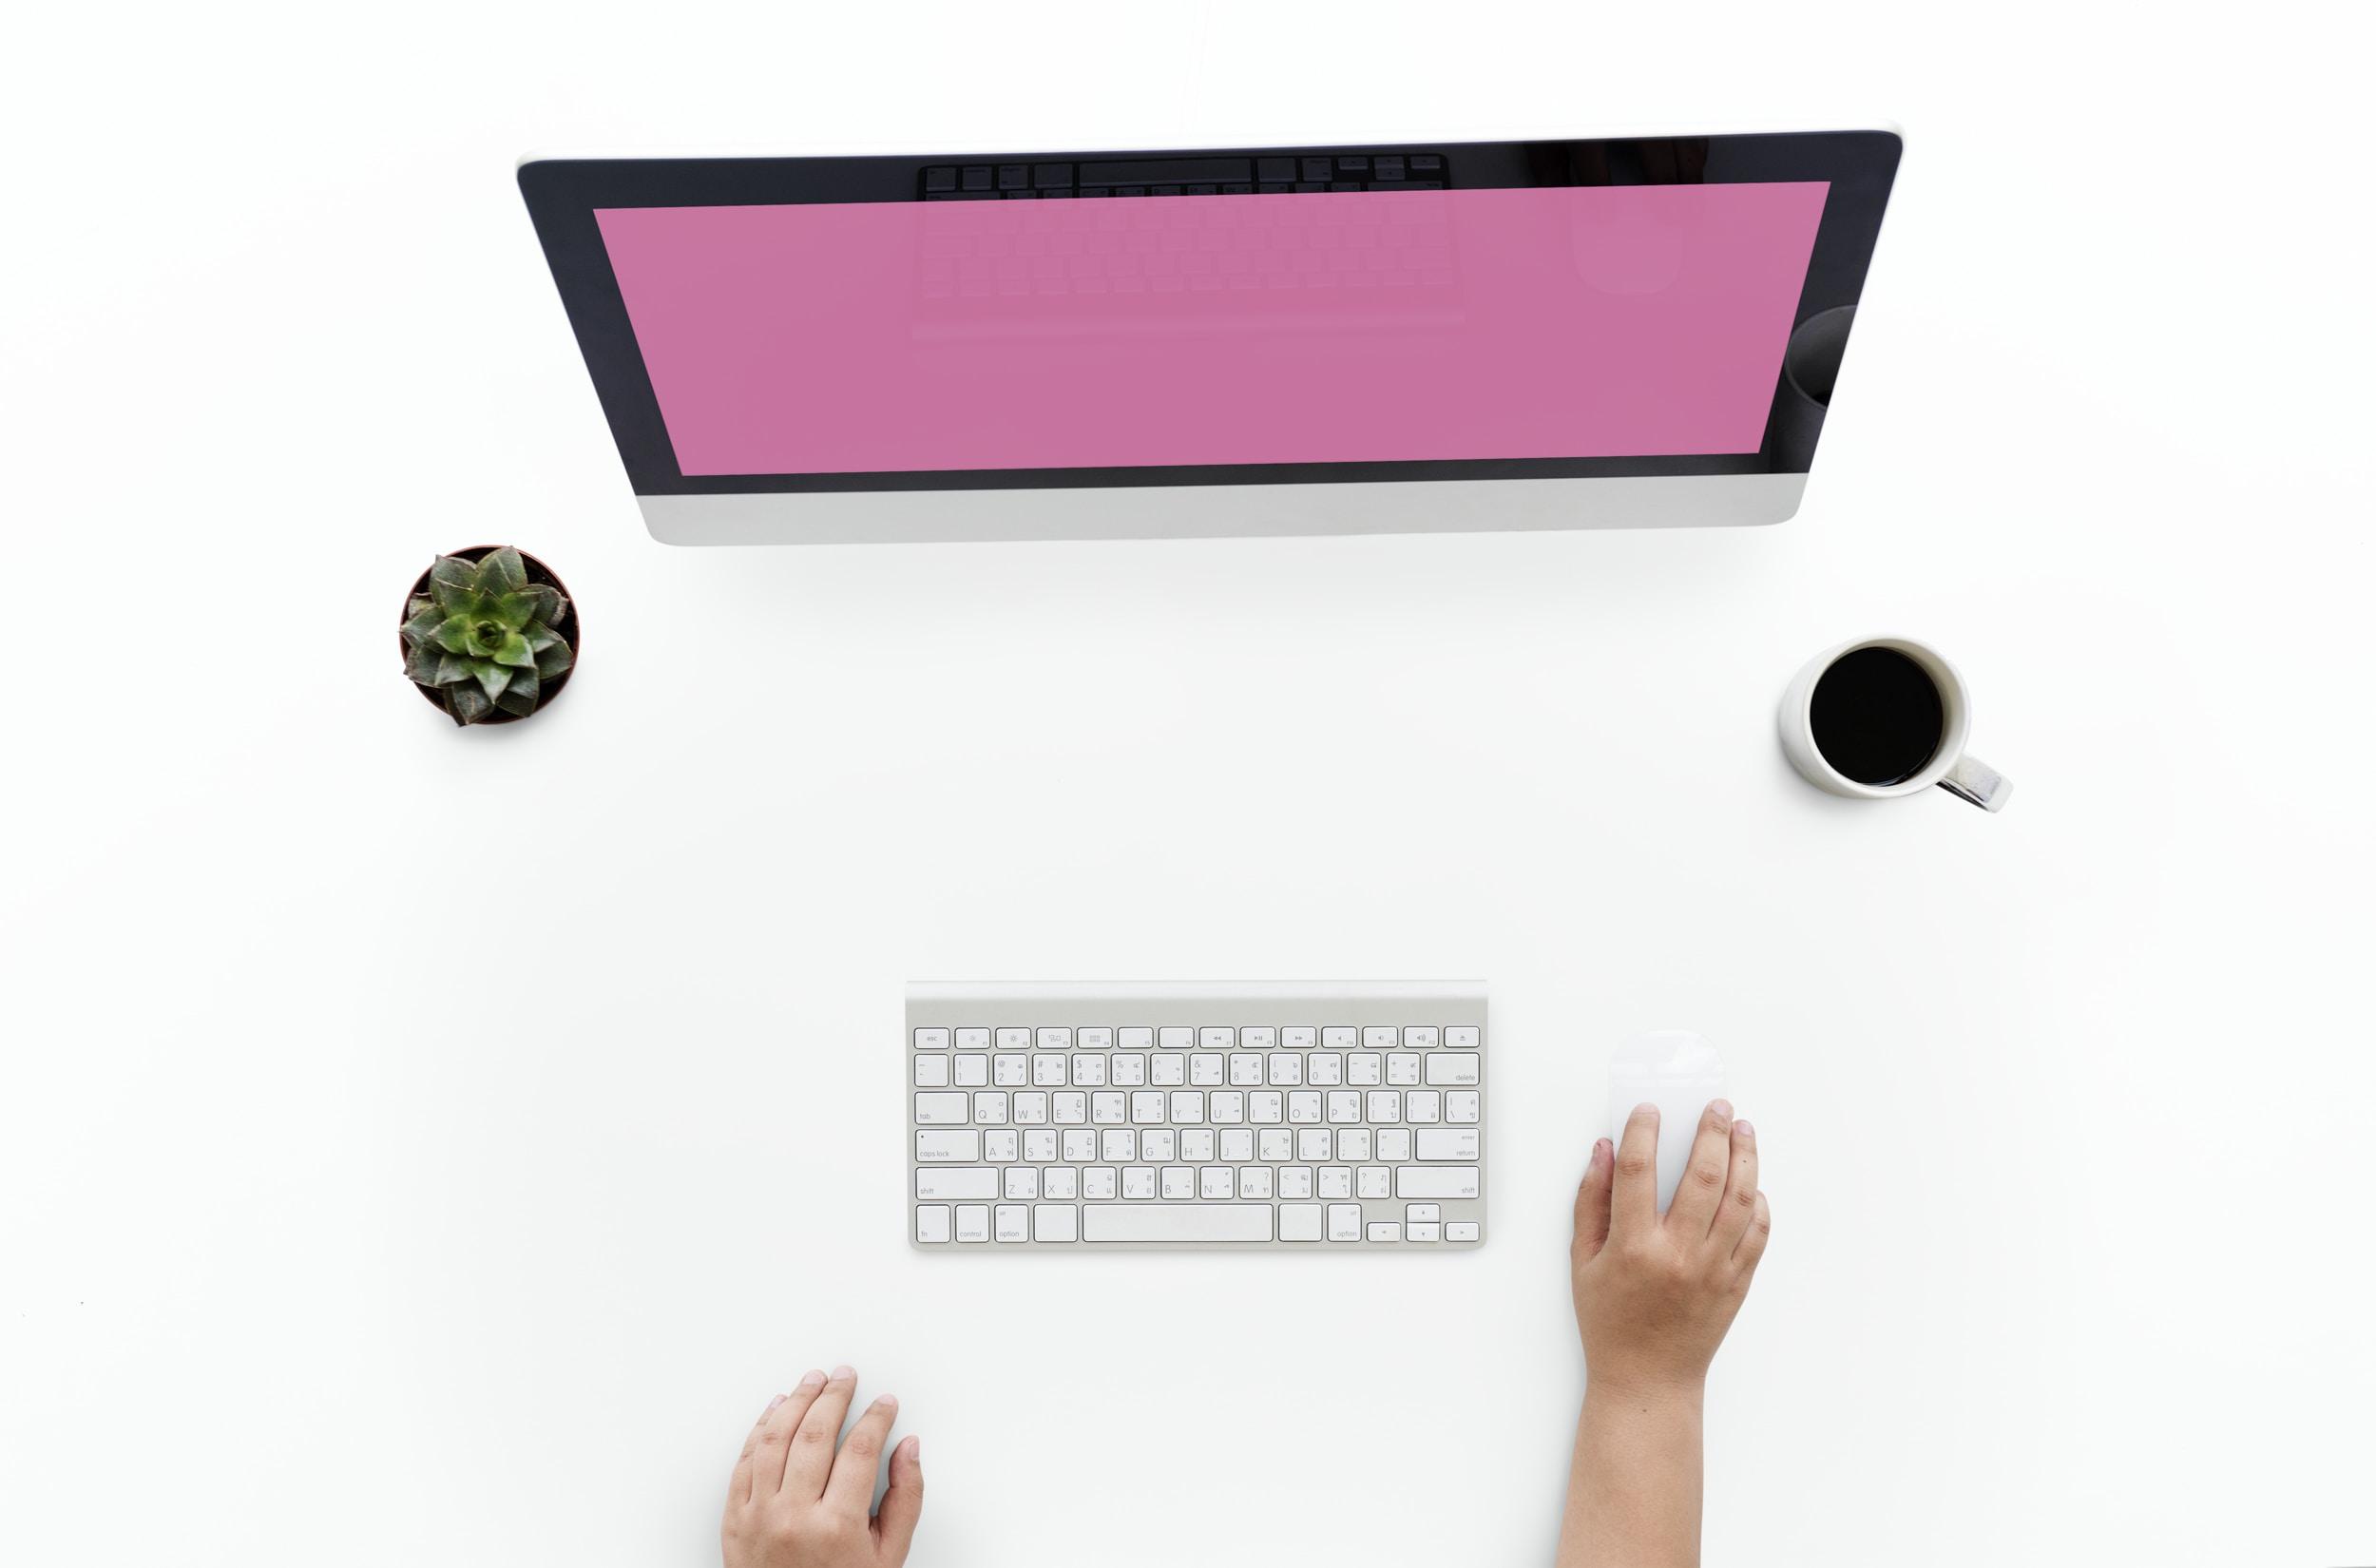 silver iMac and Wireless Keyboard on table with coffee mug